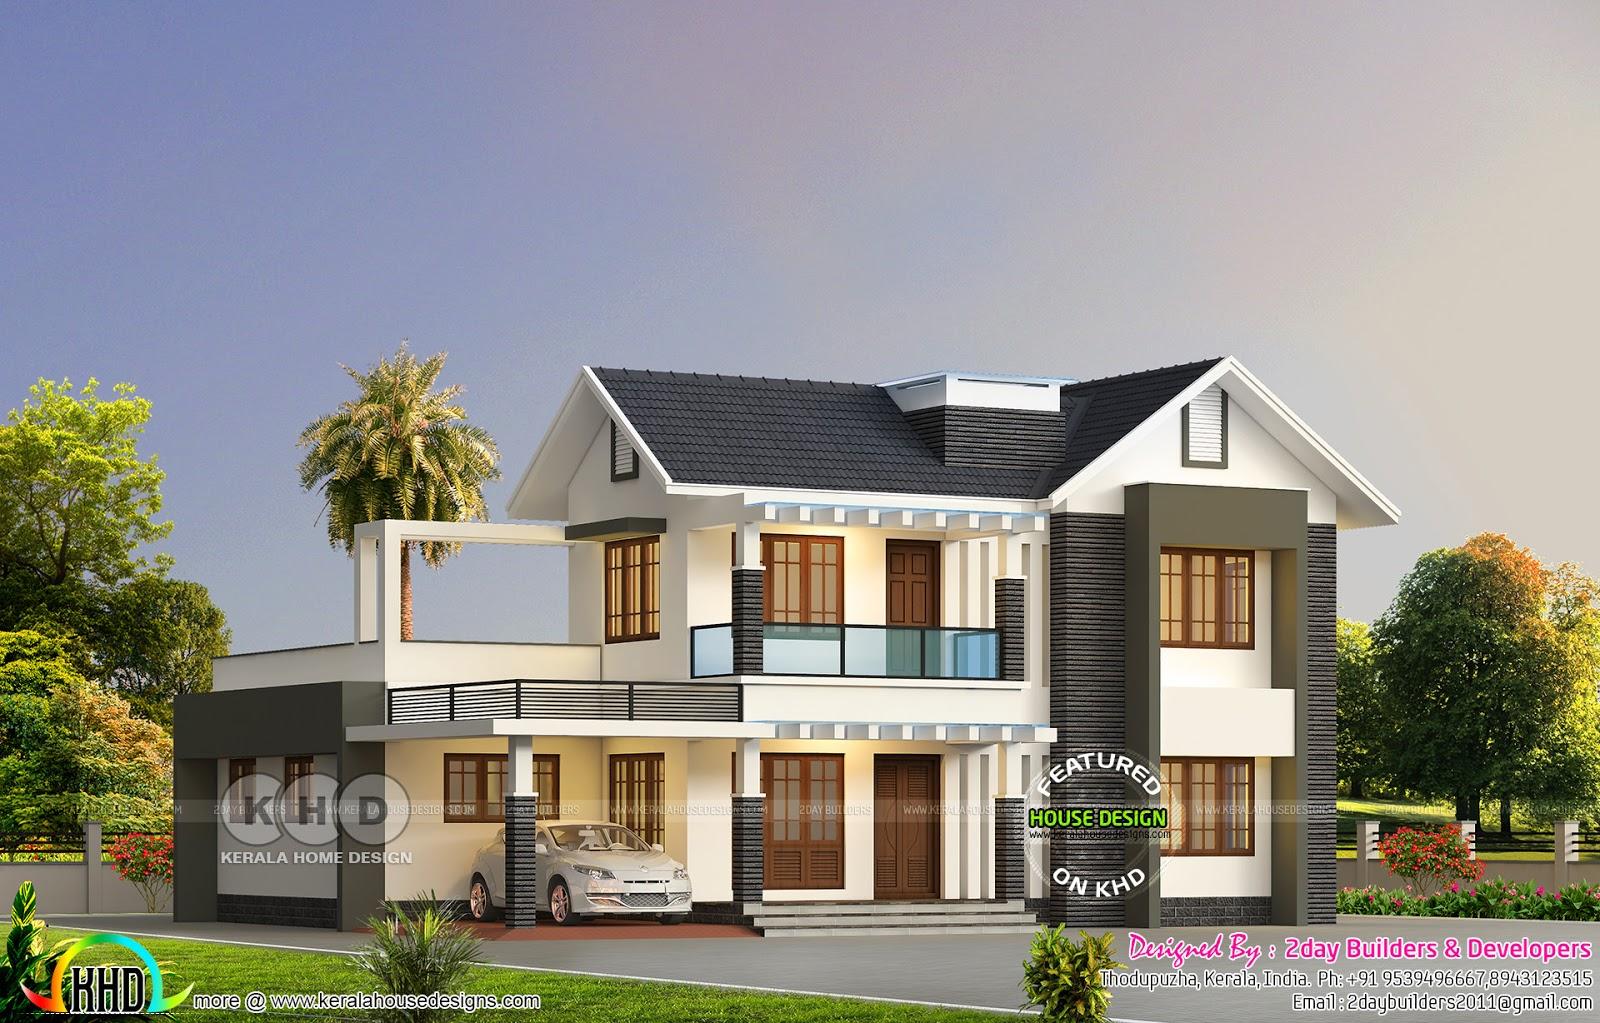 2589 Sq Ft Mixed Roof Modern House Kerala Home Design Bloglovin